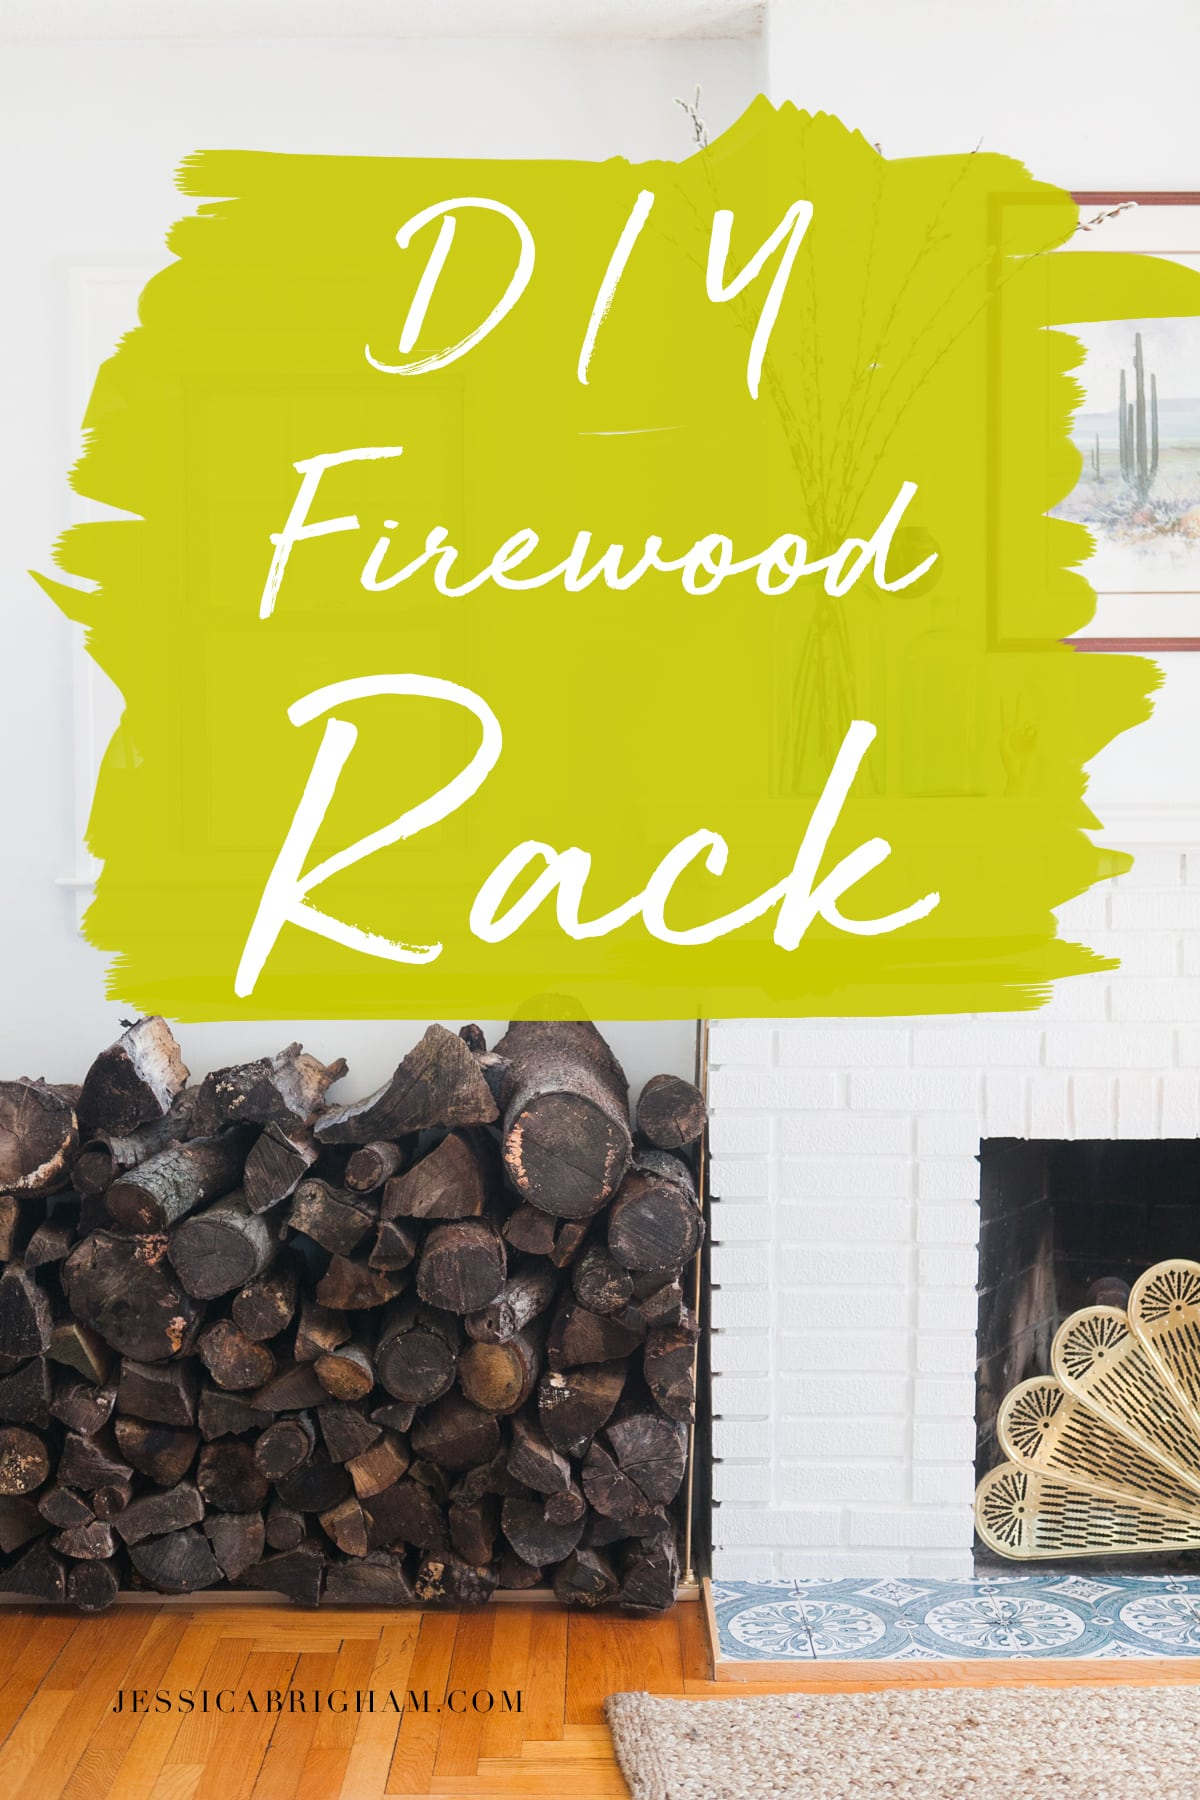 DIY Firewood Rack | Log Holder | Jessica Brigham | Magazine Ready for Life